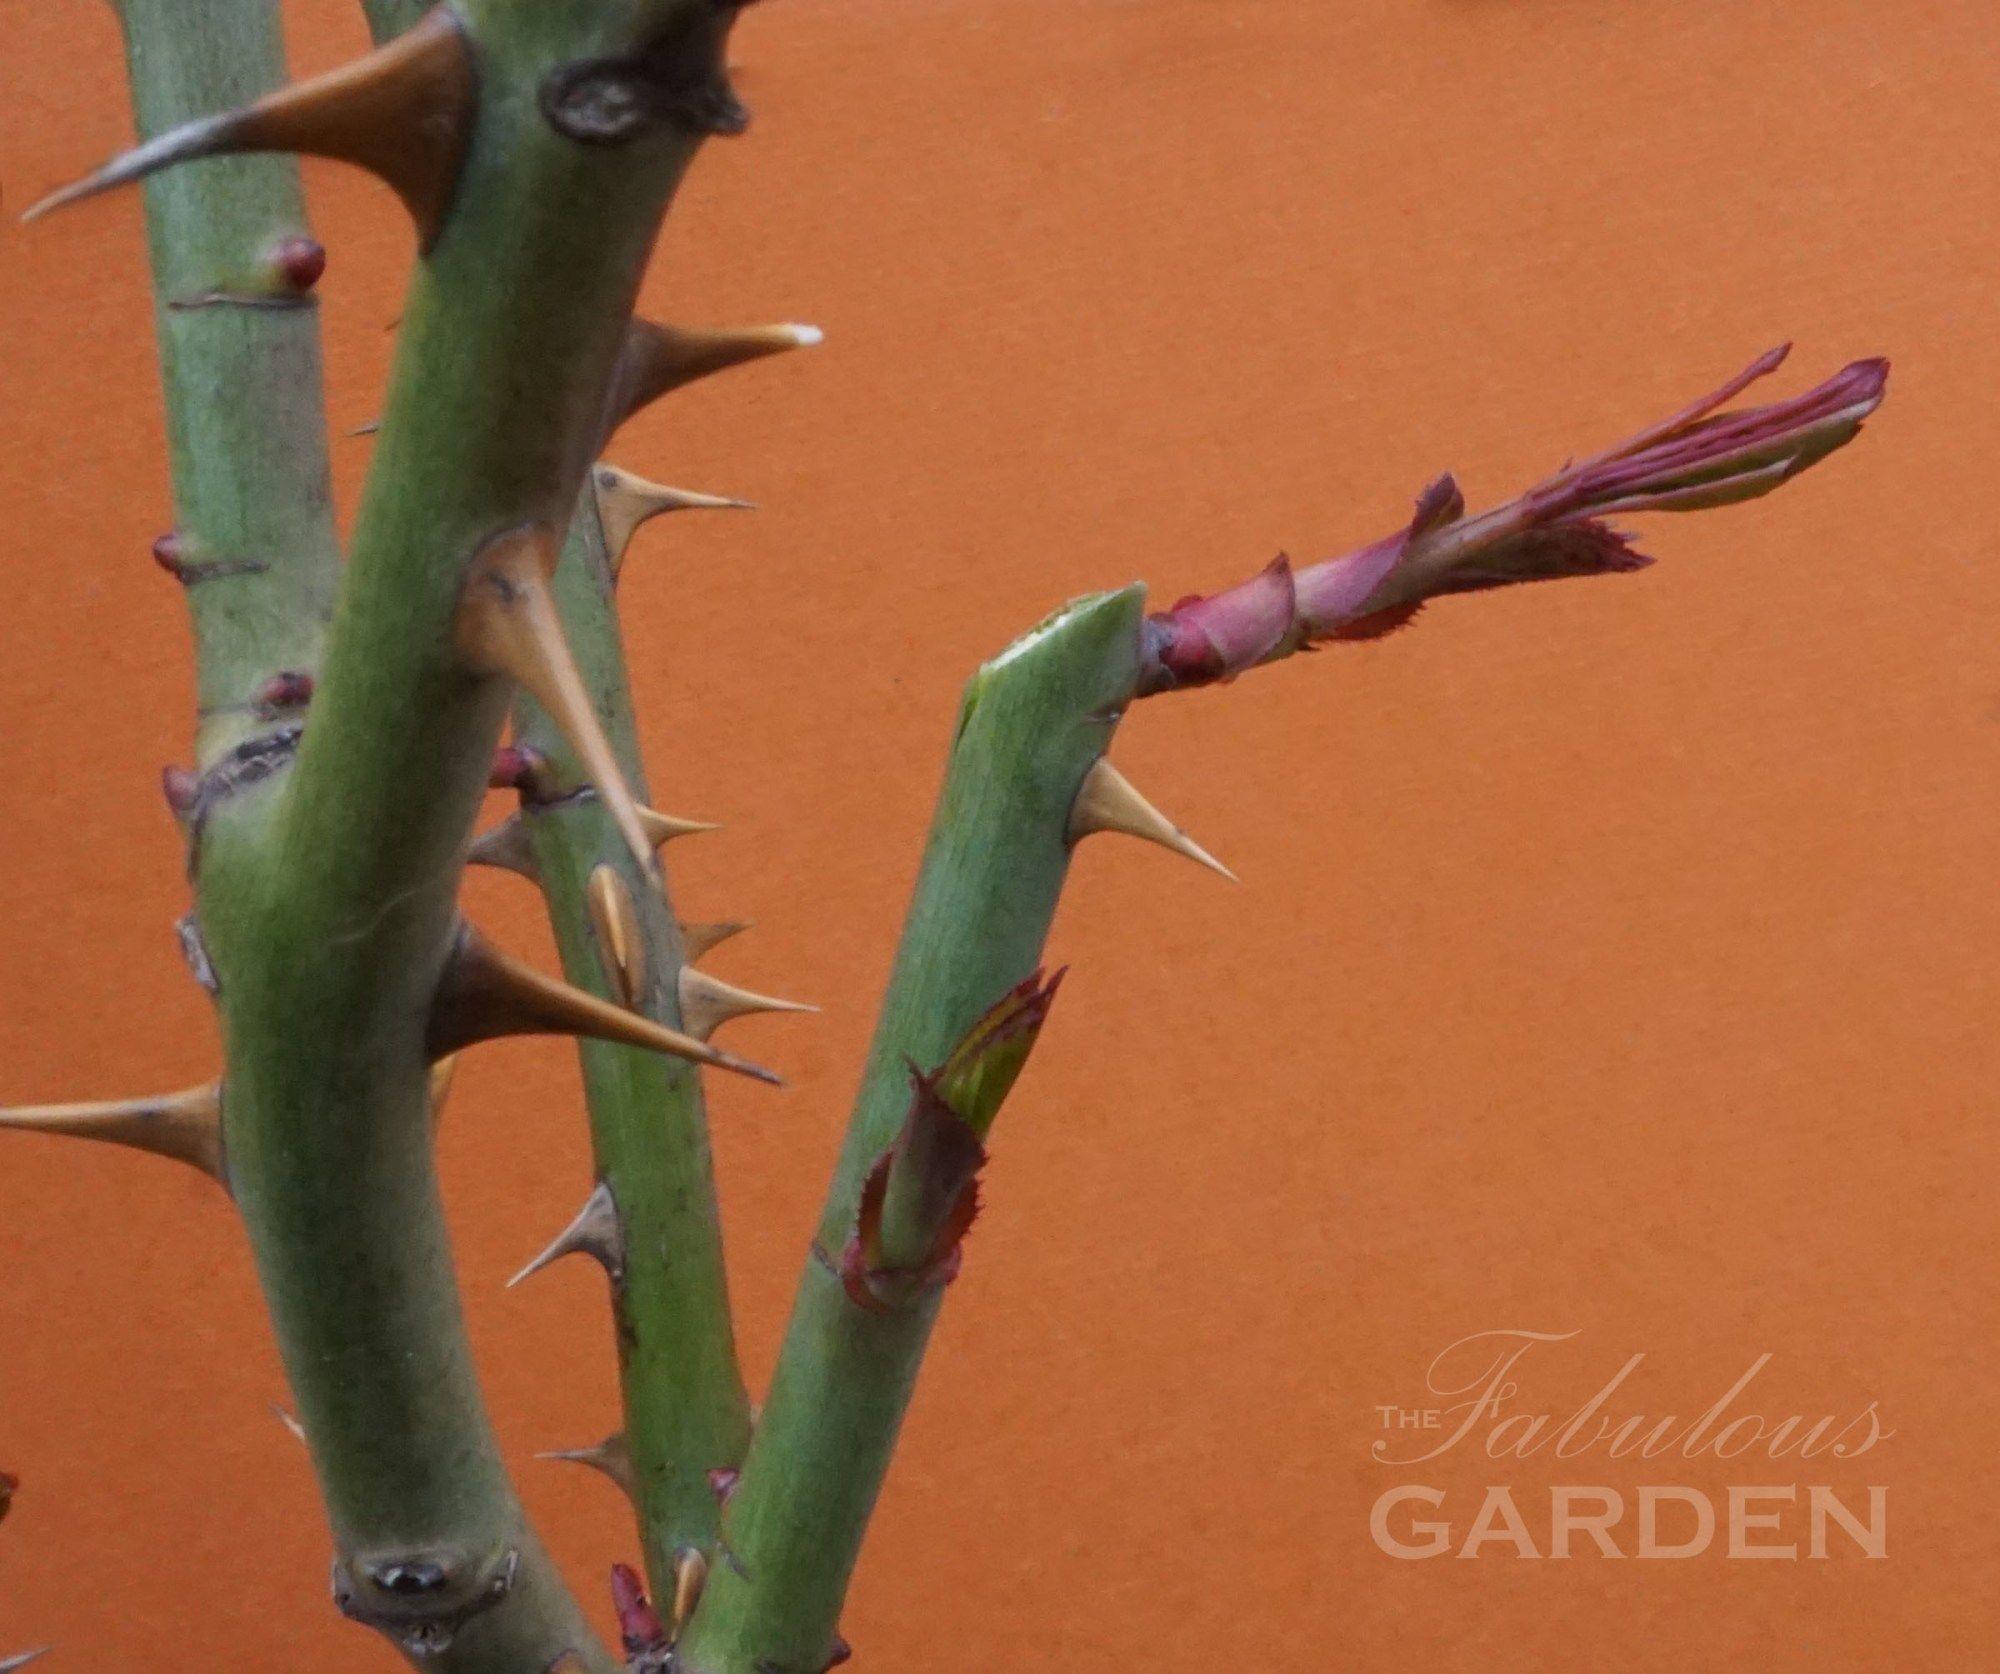 How to prune roses gardening pinterest pruning roses garden